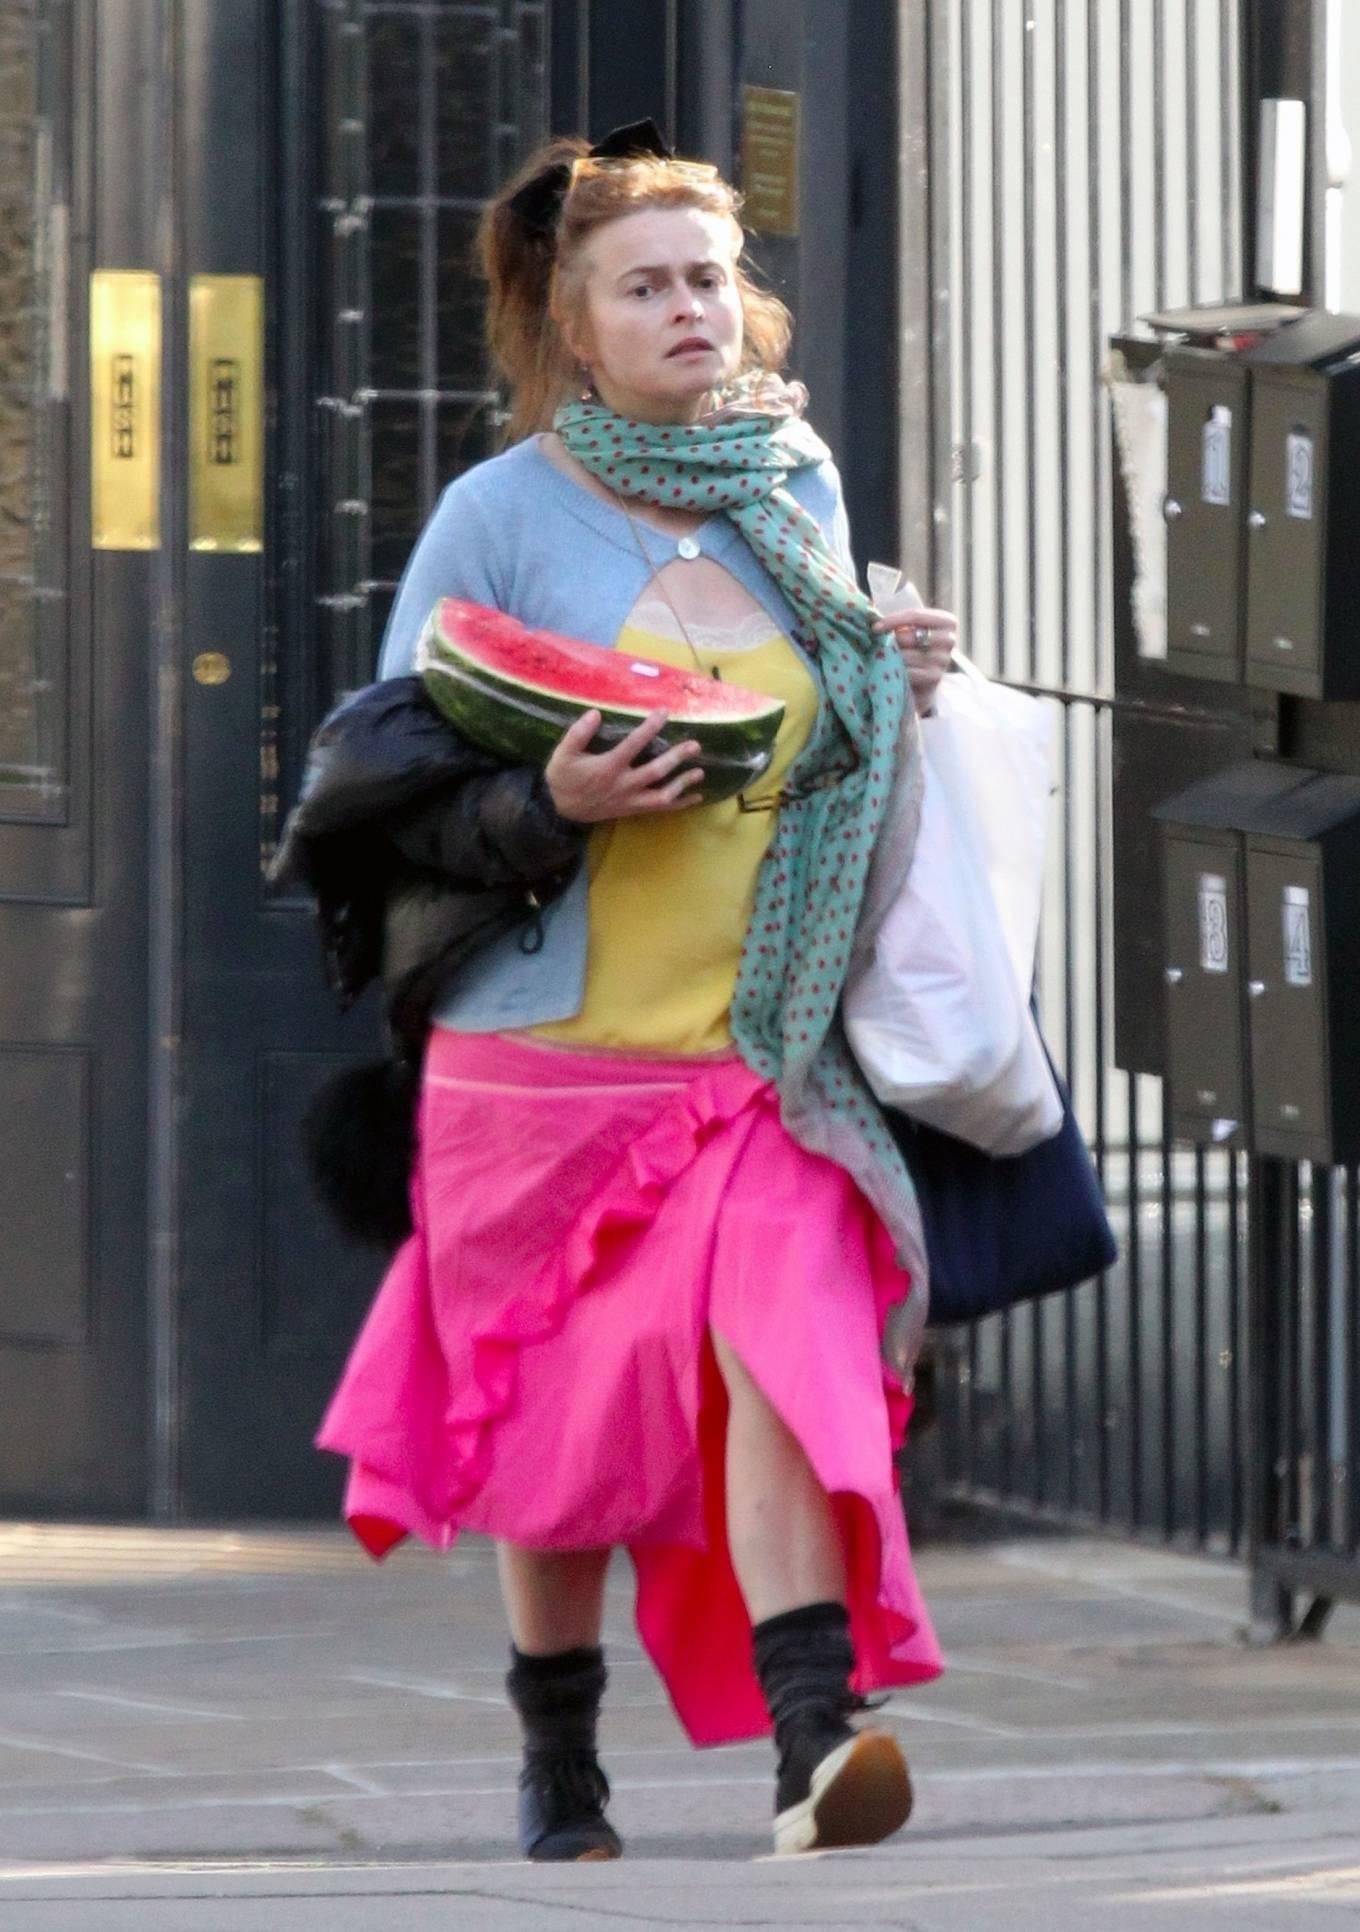 Helena Bonham Carter - Seen picking up a huge watermelon on her way home in London